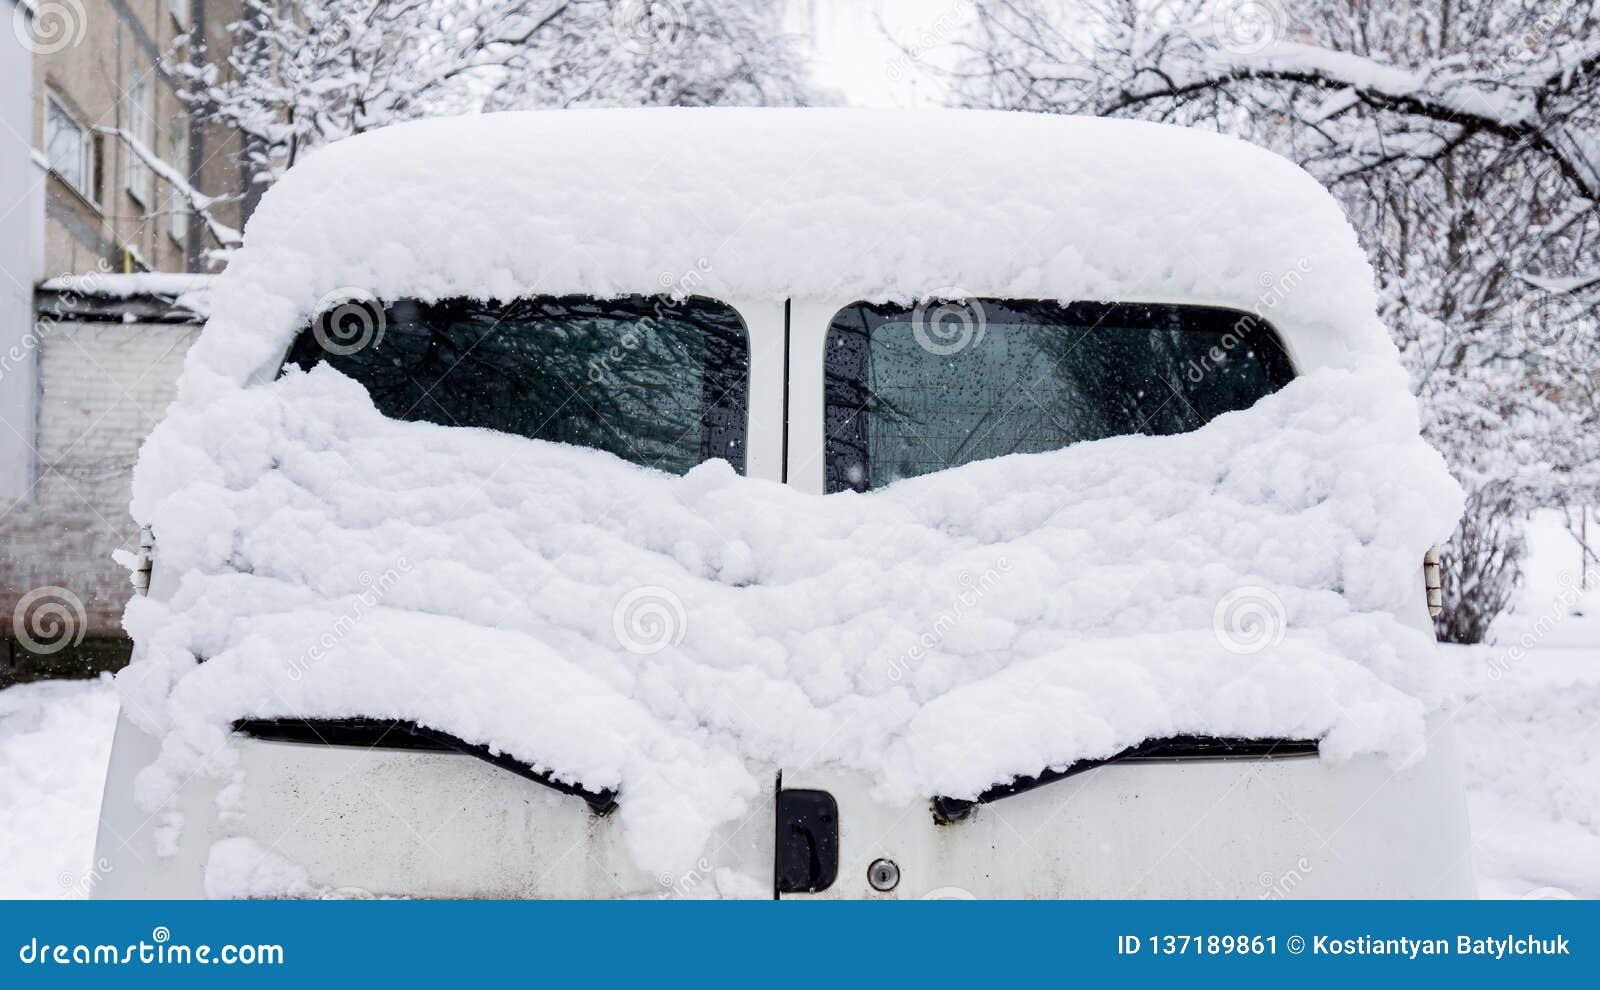 Snow on cars after snowfall. rear window, eye-like